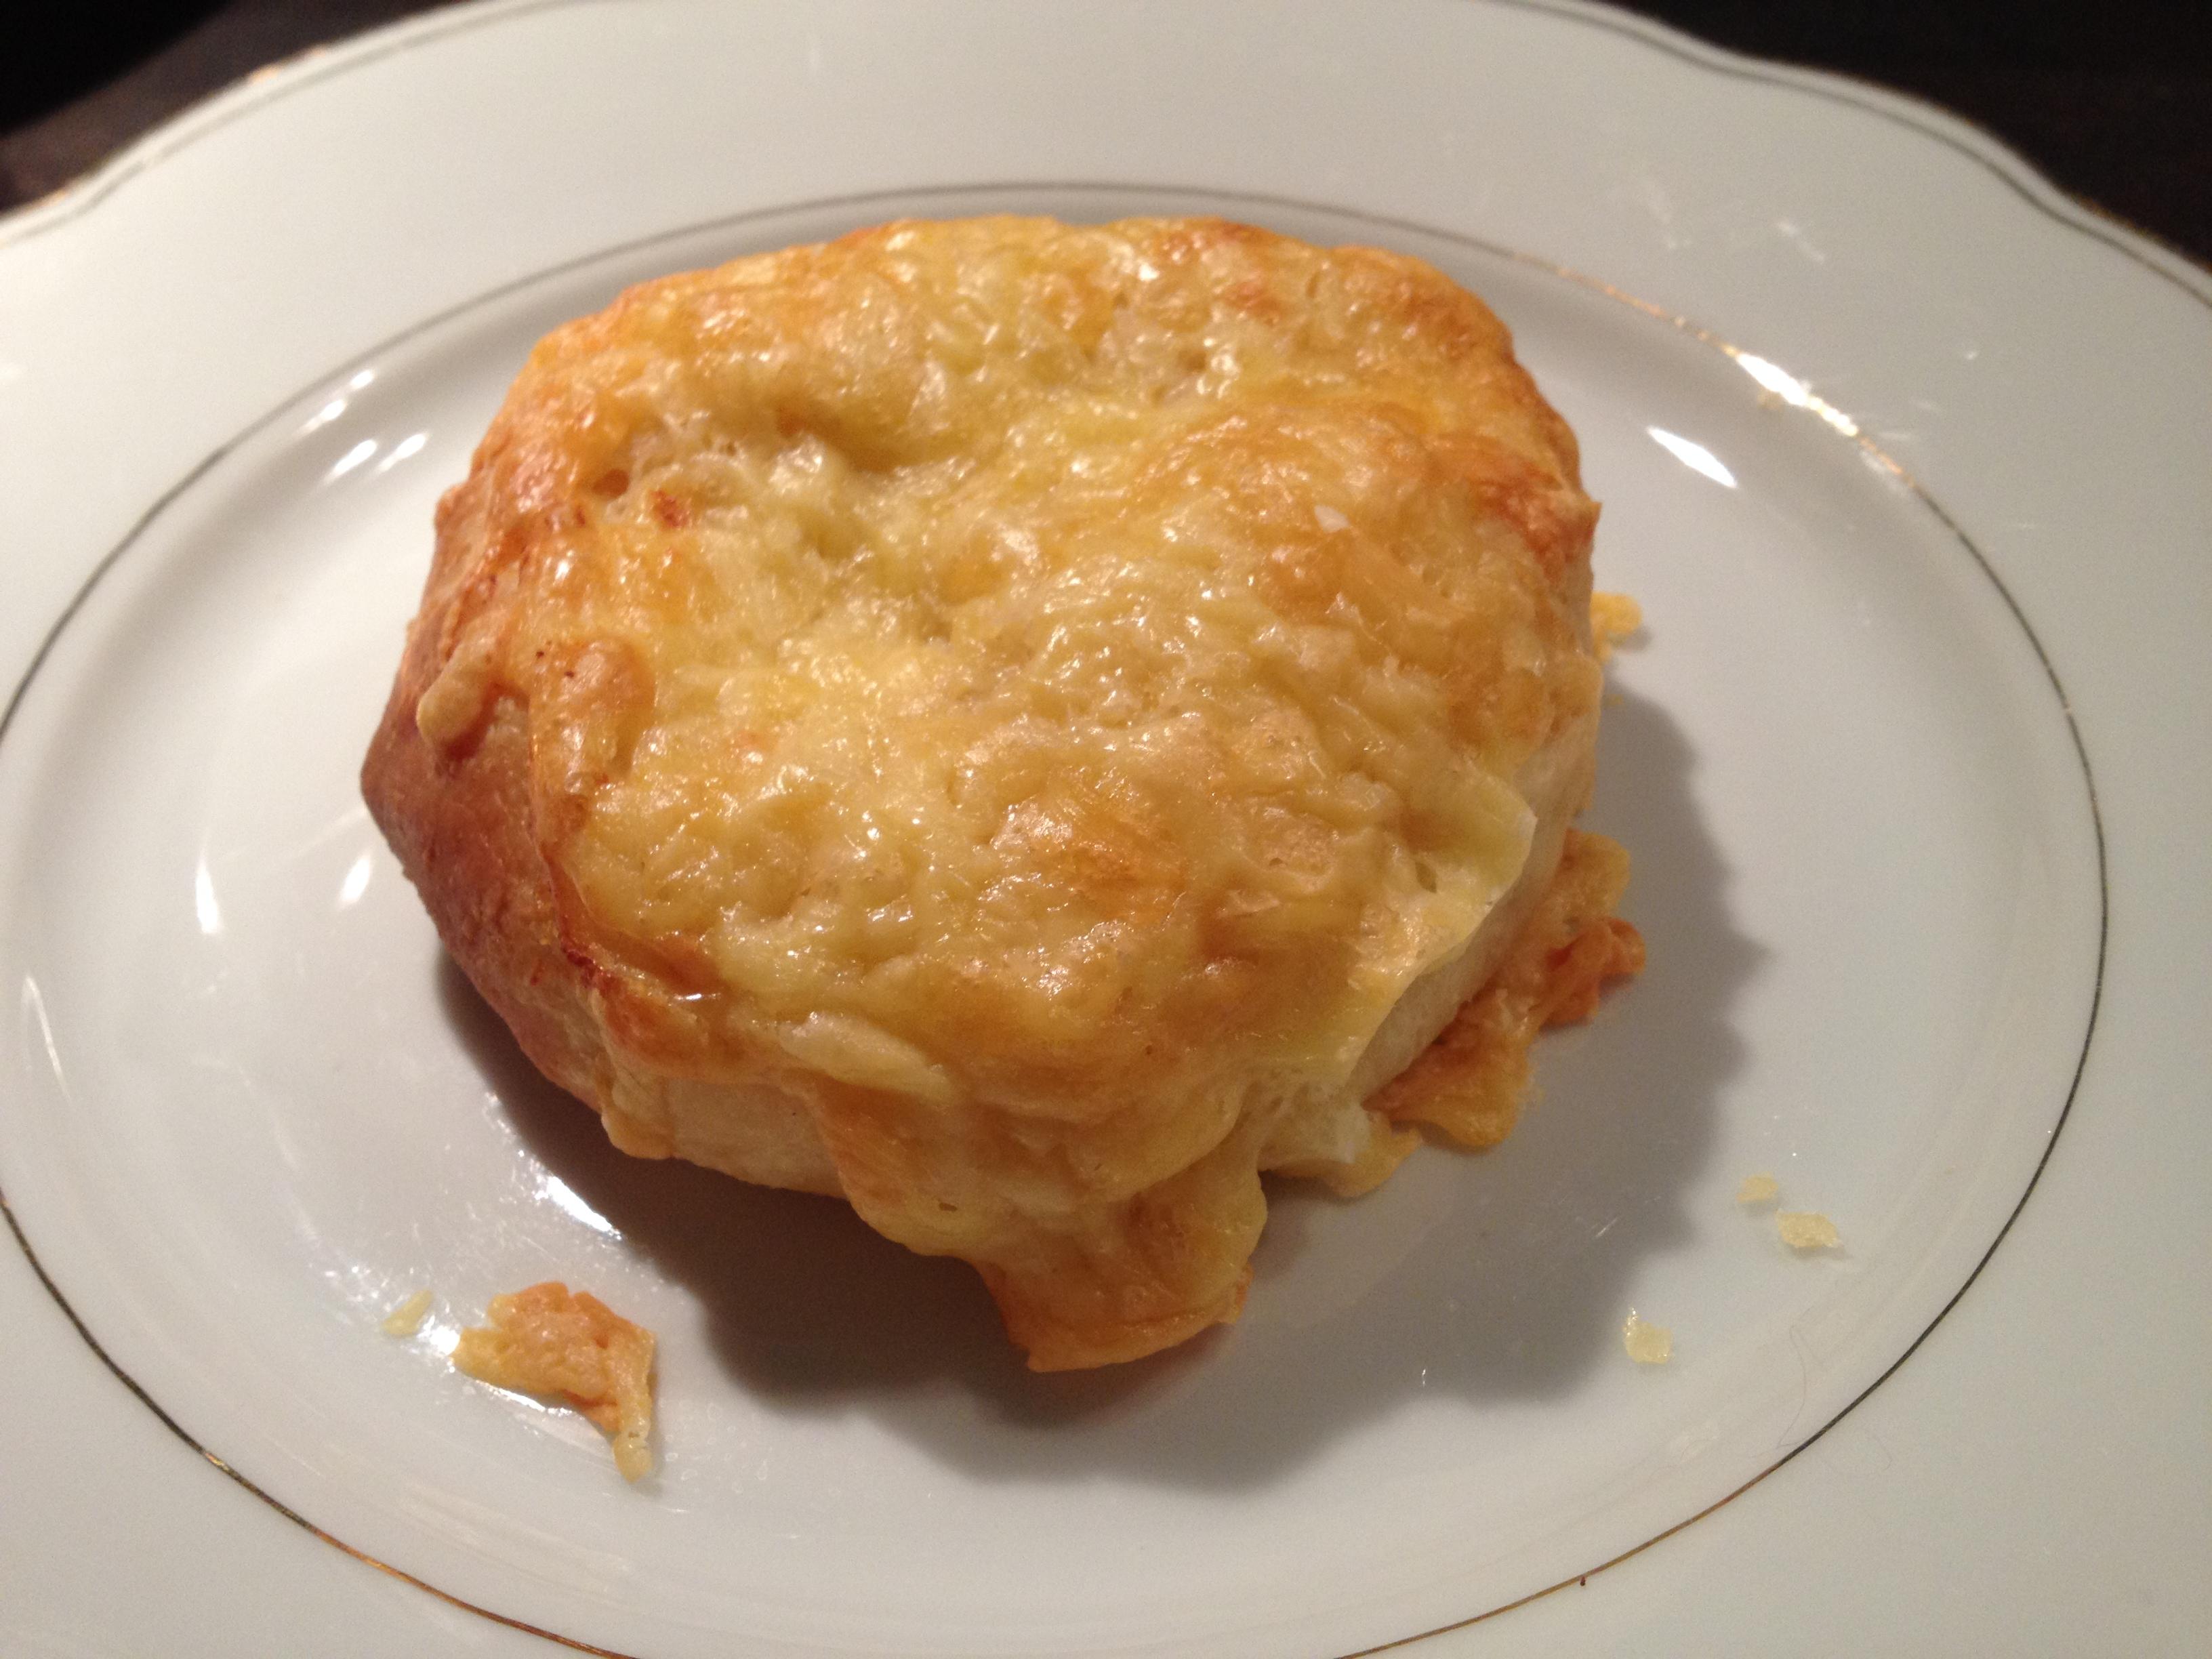 Käse-Knoblauch-Brötchen